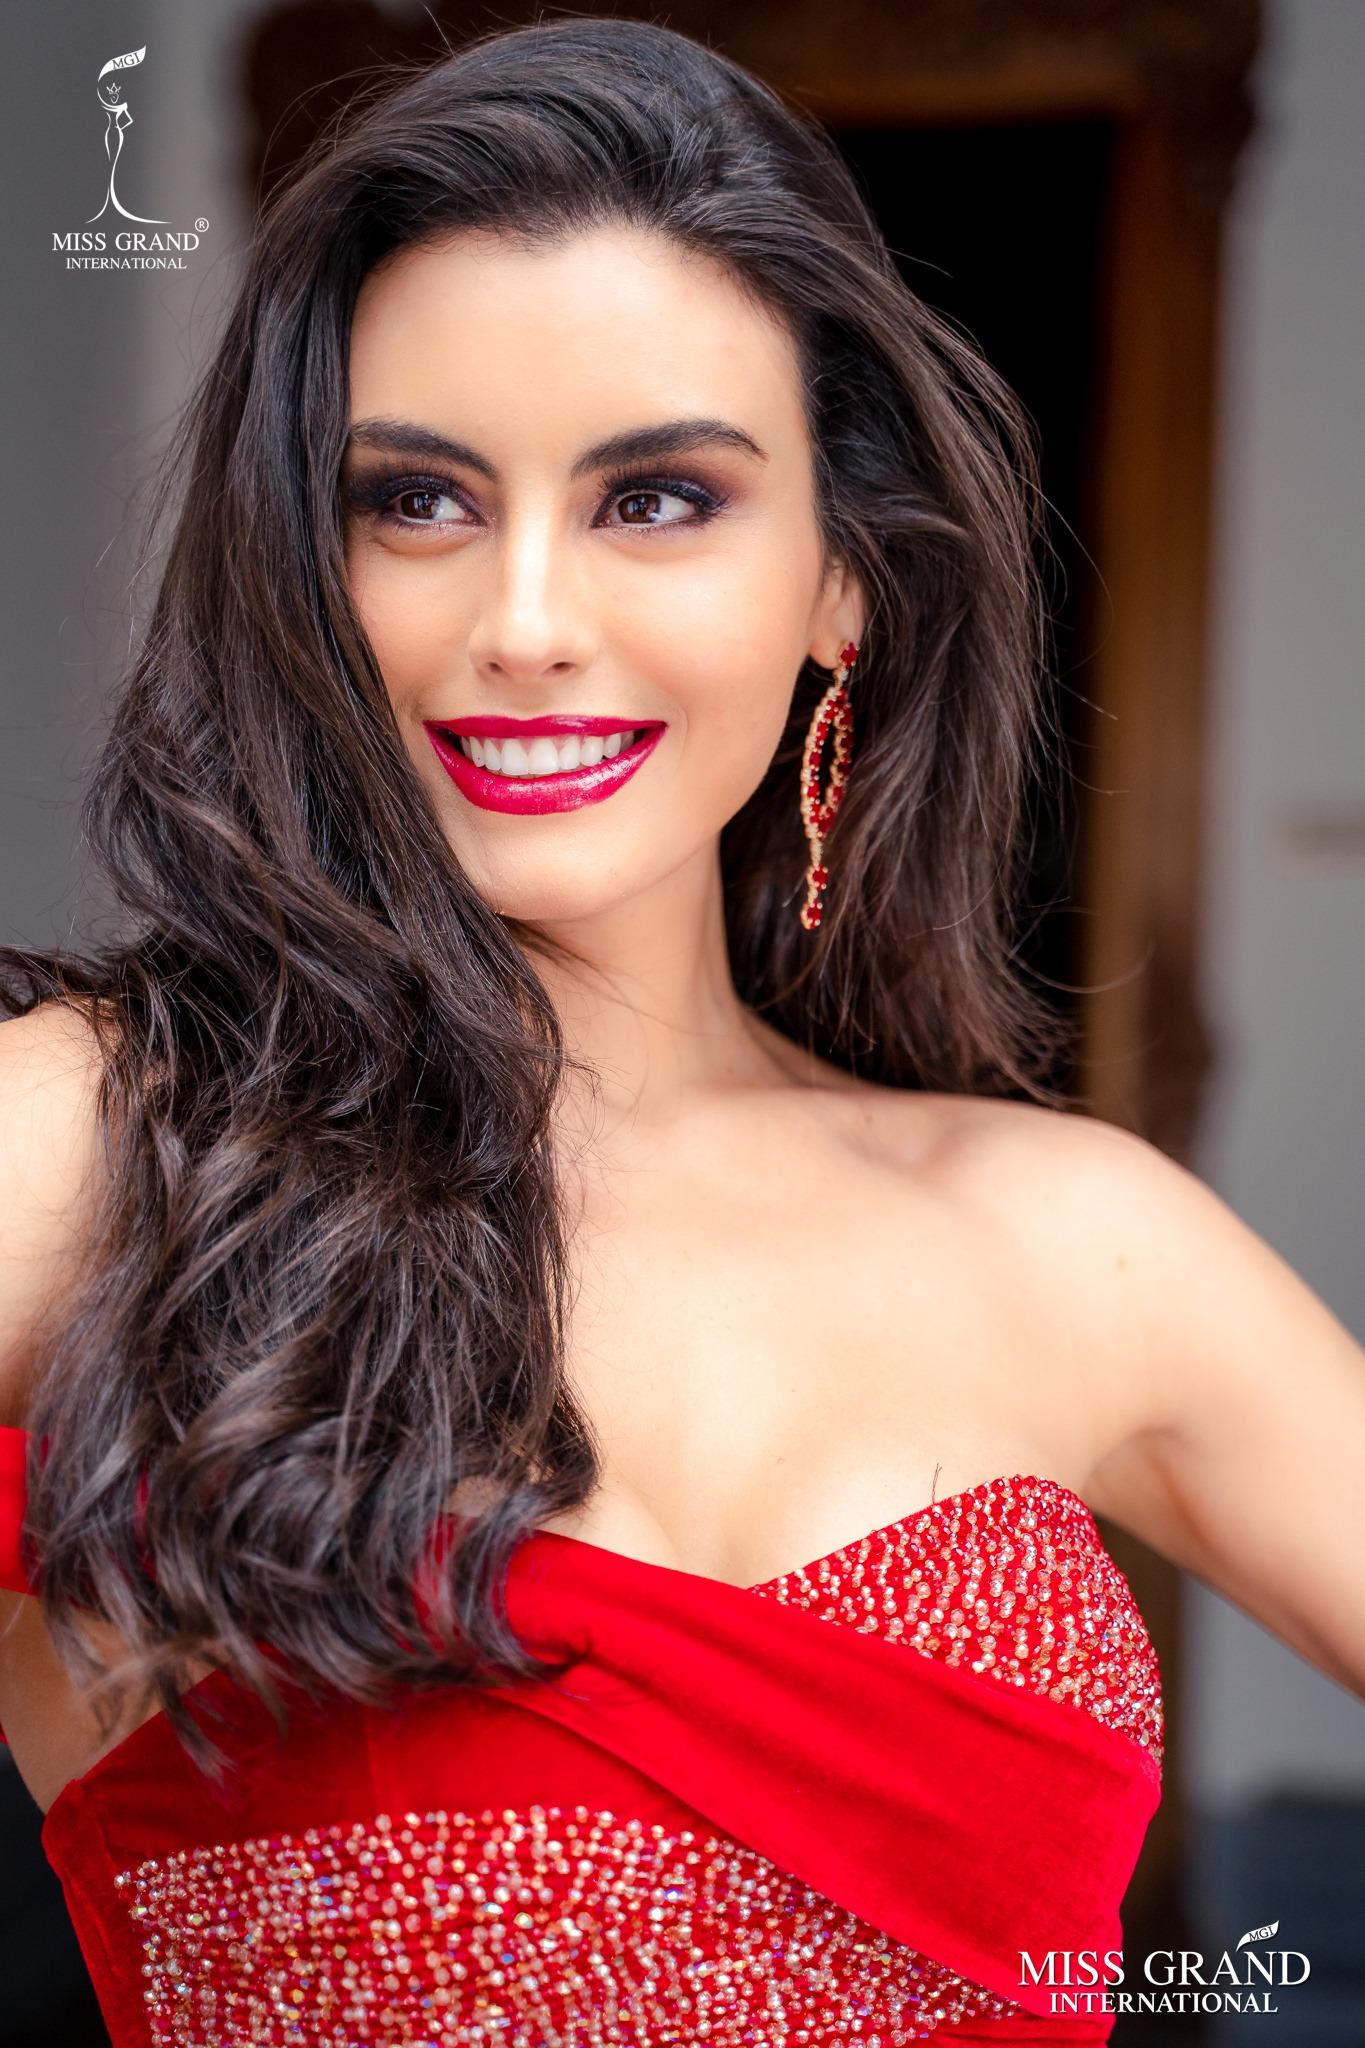 marjorie marcelle, top 5 de miss grand international 2019. - Página 34 72726710